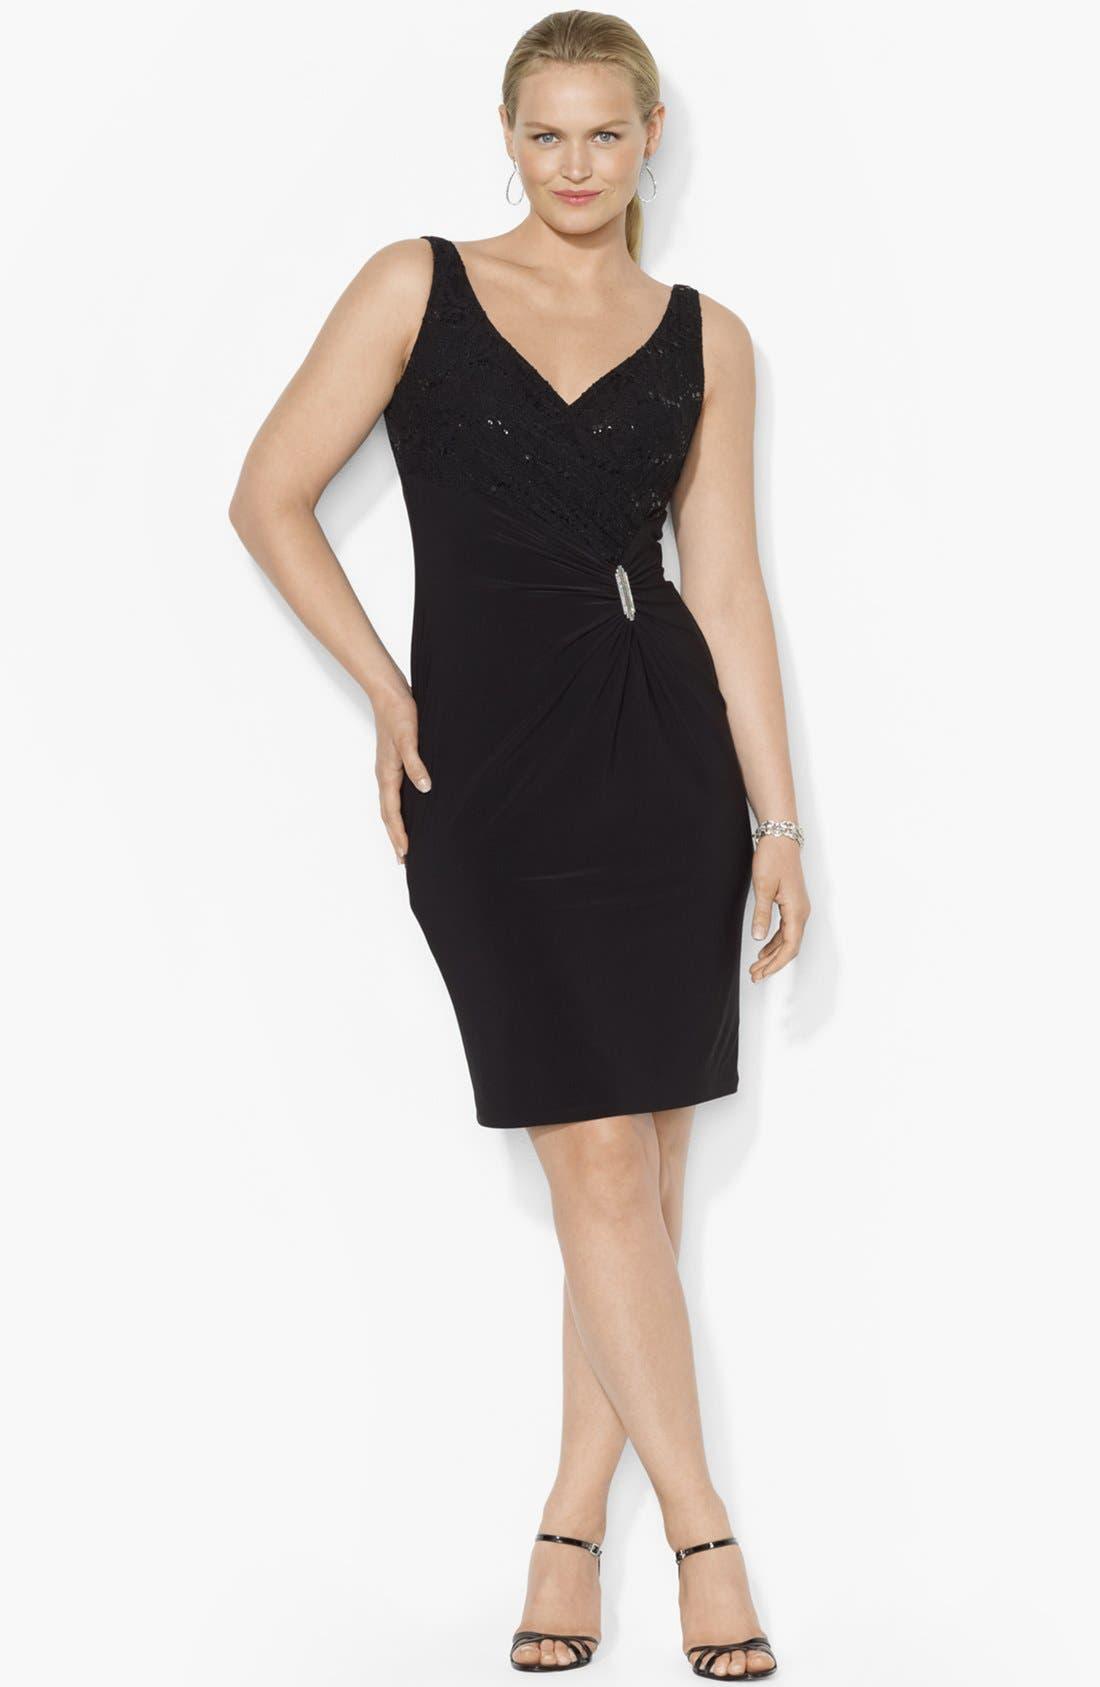 Alternate Image 1 Selected - Lauren Ralph Lauren Embellished Lace & Jersey Sheath Dress (Plus Size)